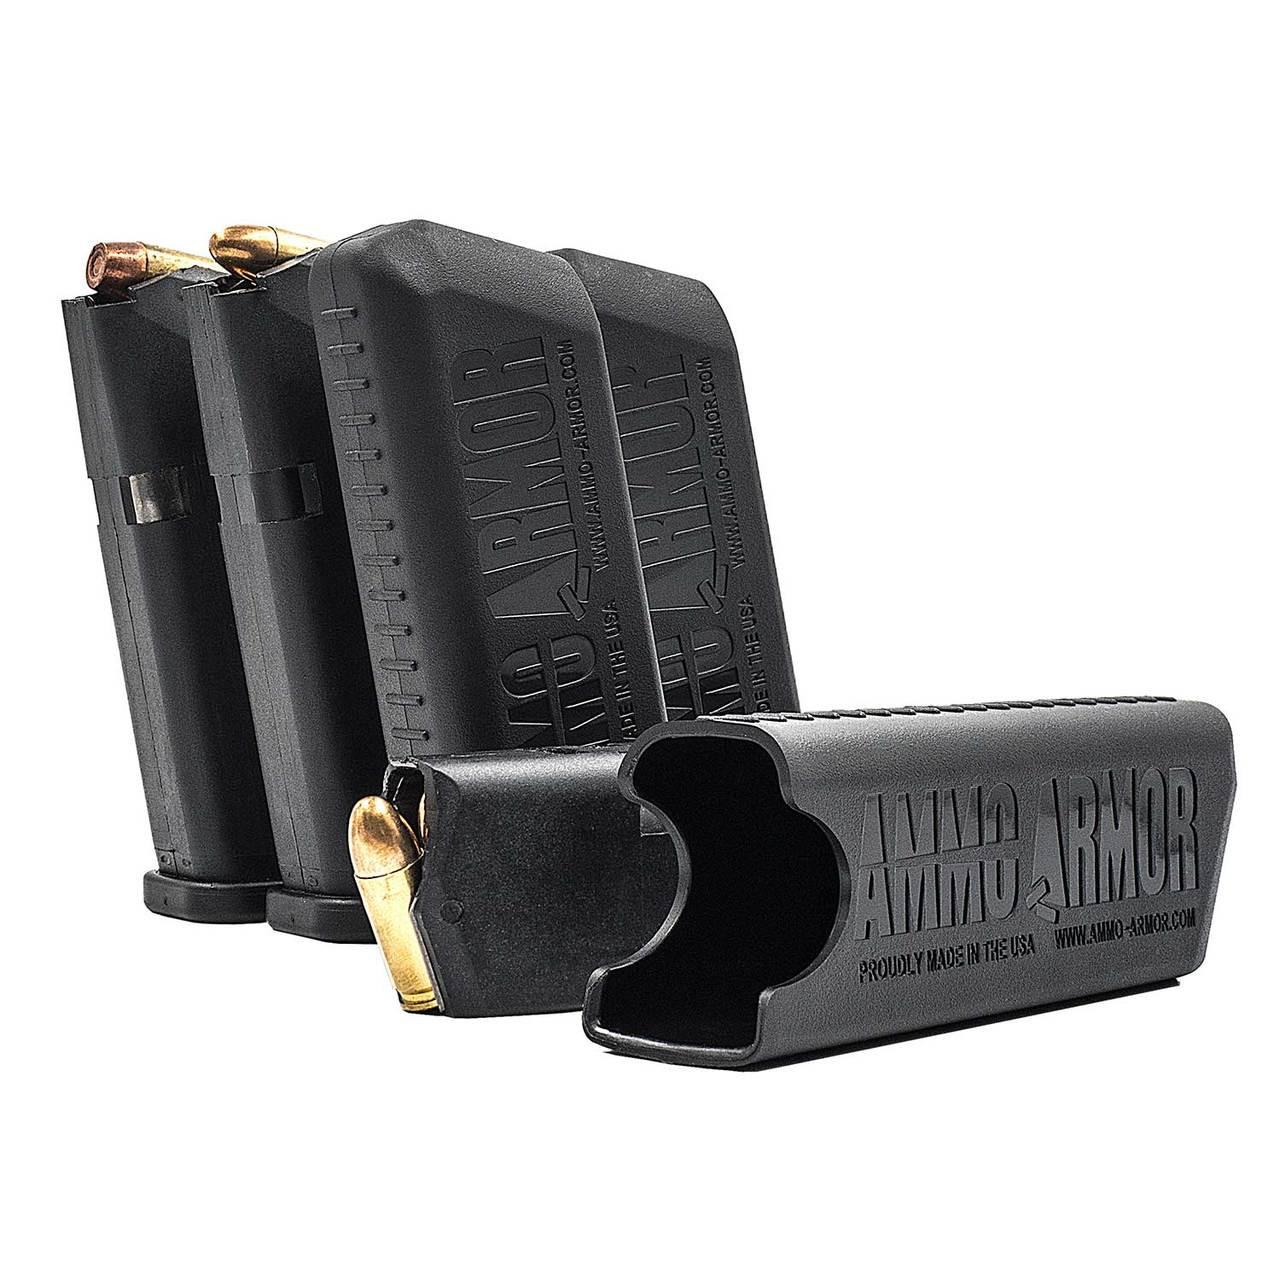 Walther PPK & PPK/S Magazine Case